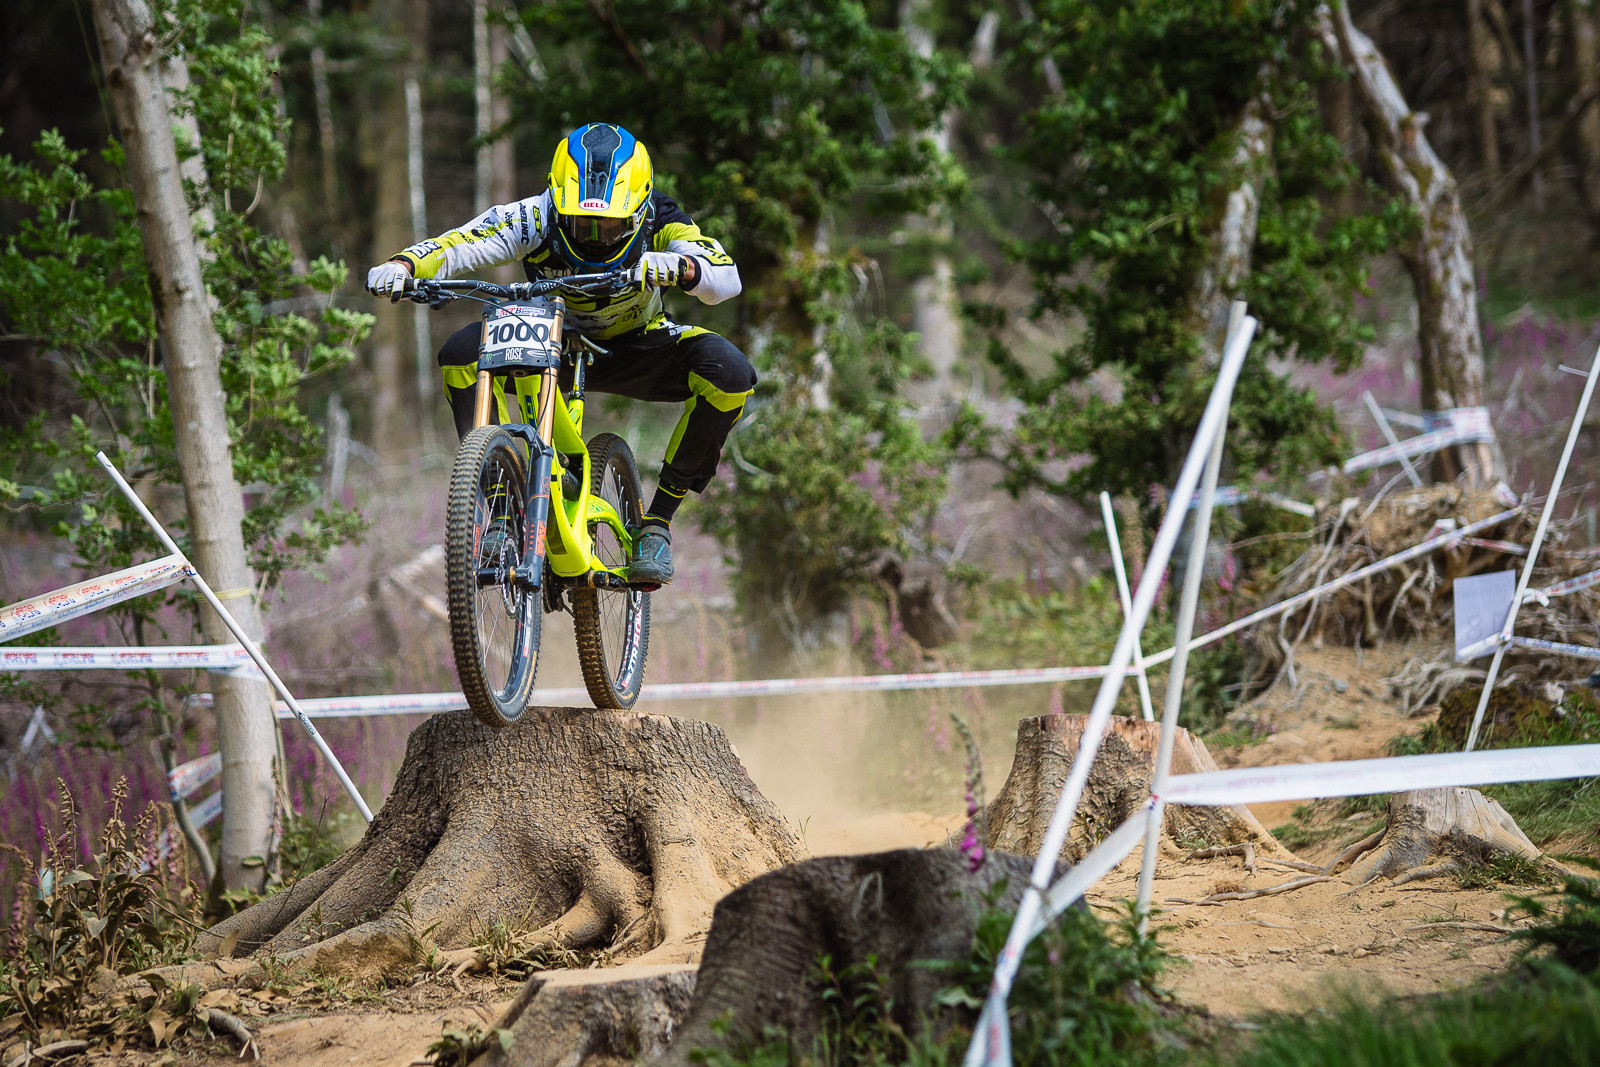 Dan Atherton, British DH Series, Bala - RACE REPORT - 2015 British Downhill Series Bala - Mountain Biking Pictures - Vital MTB